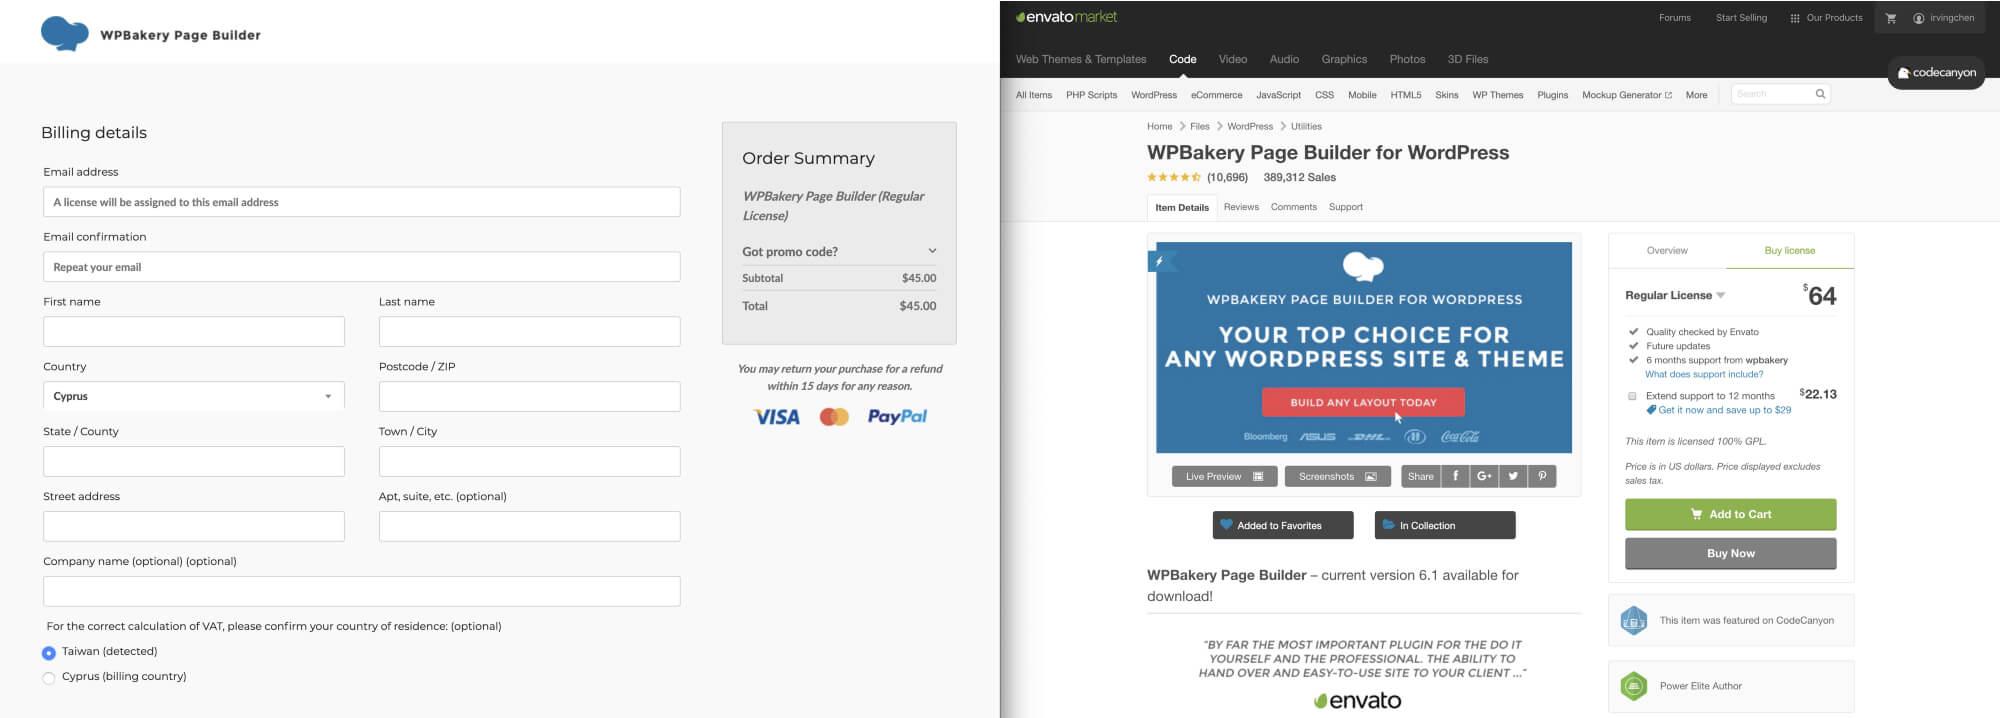 WPBakery Page Builder 在官網和在 Themeforest 購買的價格差異-IrvingLab 爾文實驗室